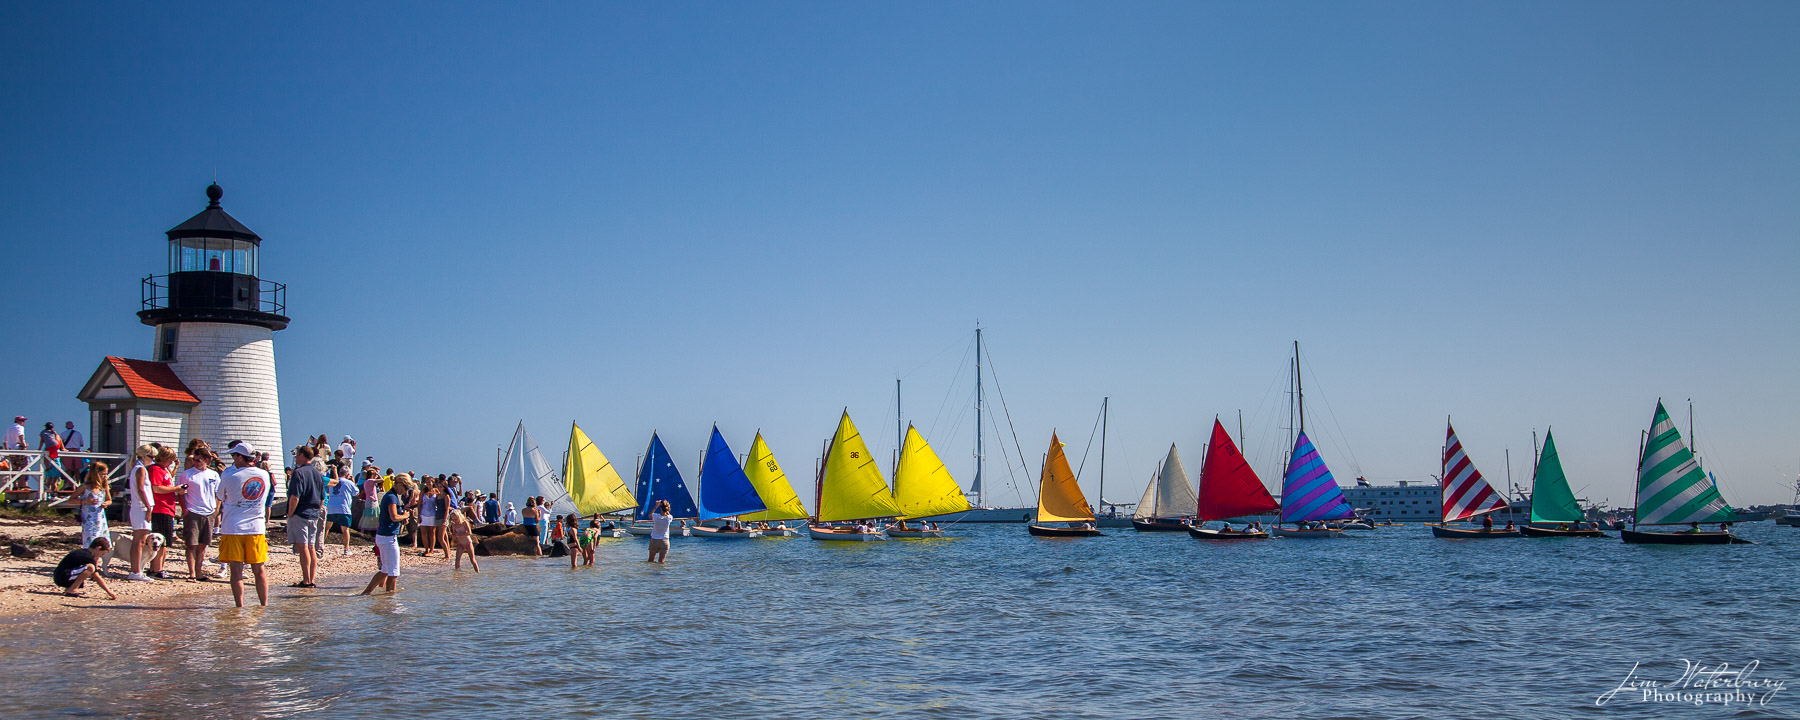 rainbow fleet, parade, Nantucket Race Week, NRW, sailing, boats, Brant Point, Opera House, photo